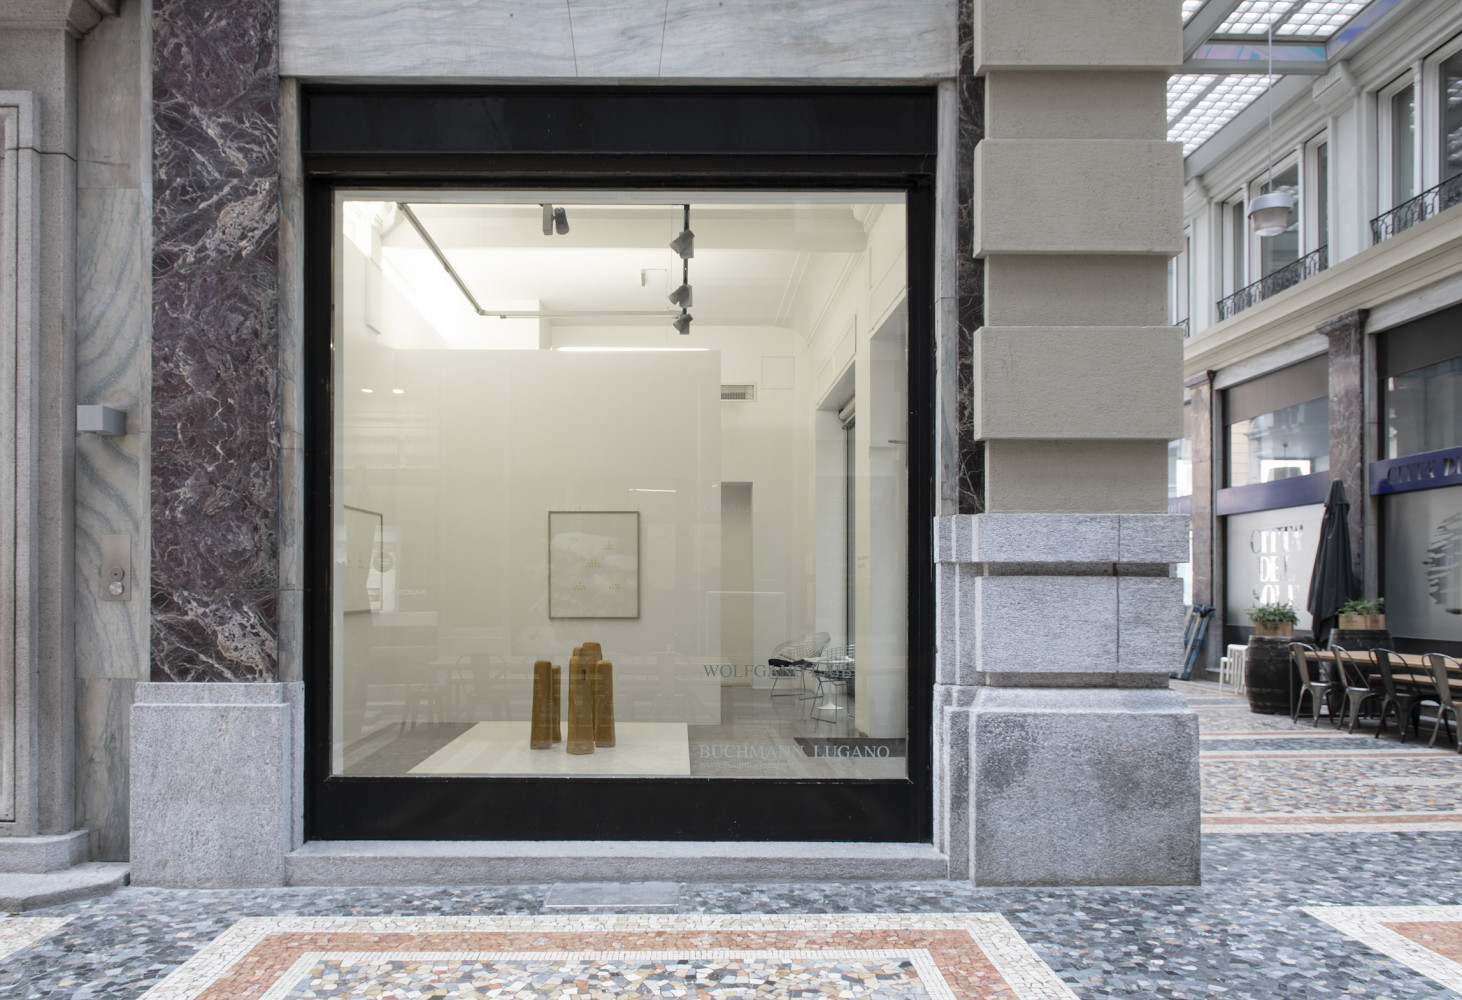 Wolfgang Laib, 'Türme des Schweigens - Towers of Silence', Installation view, Buchmann Lugano, 2020